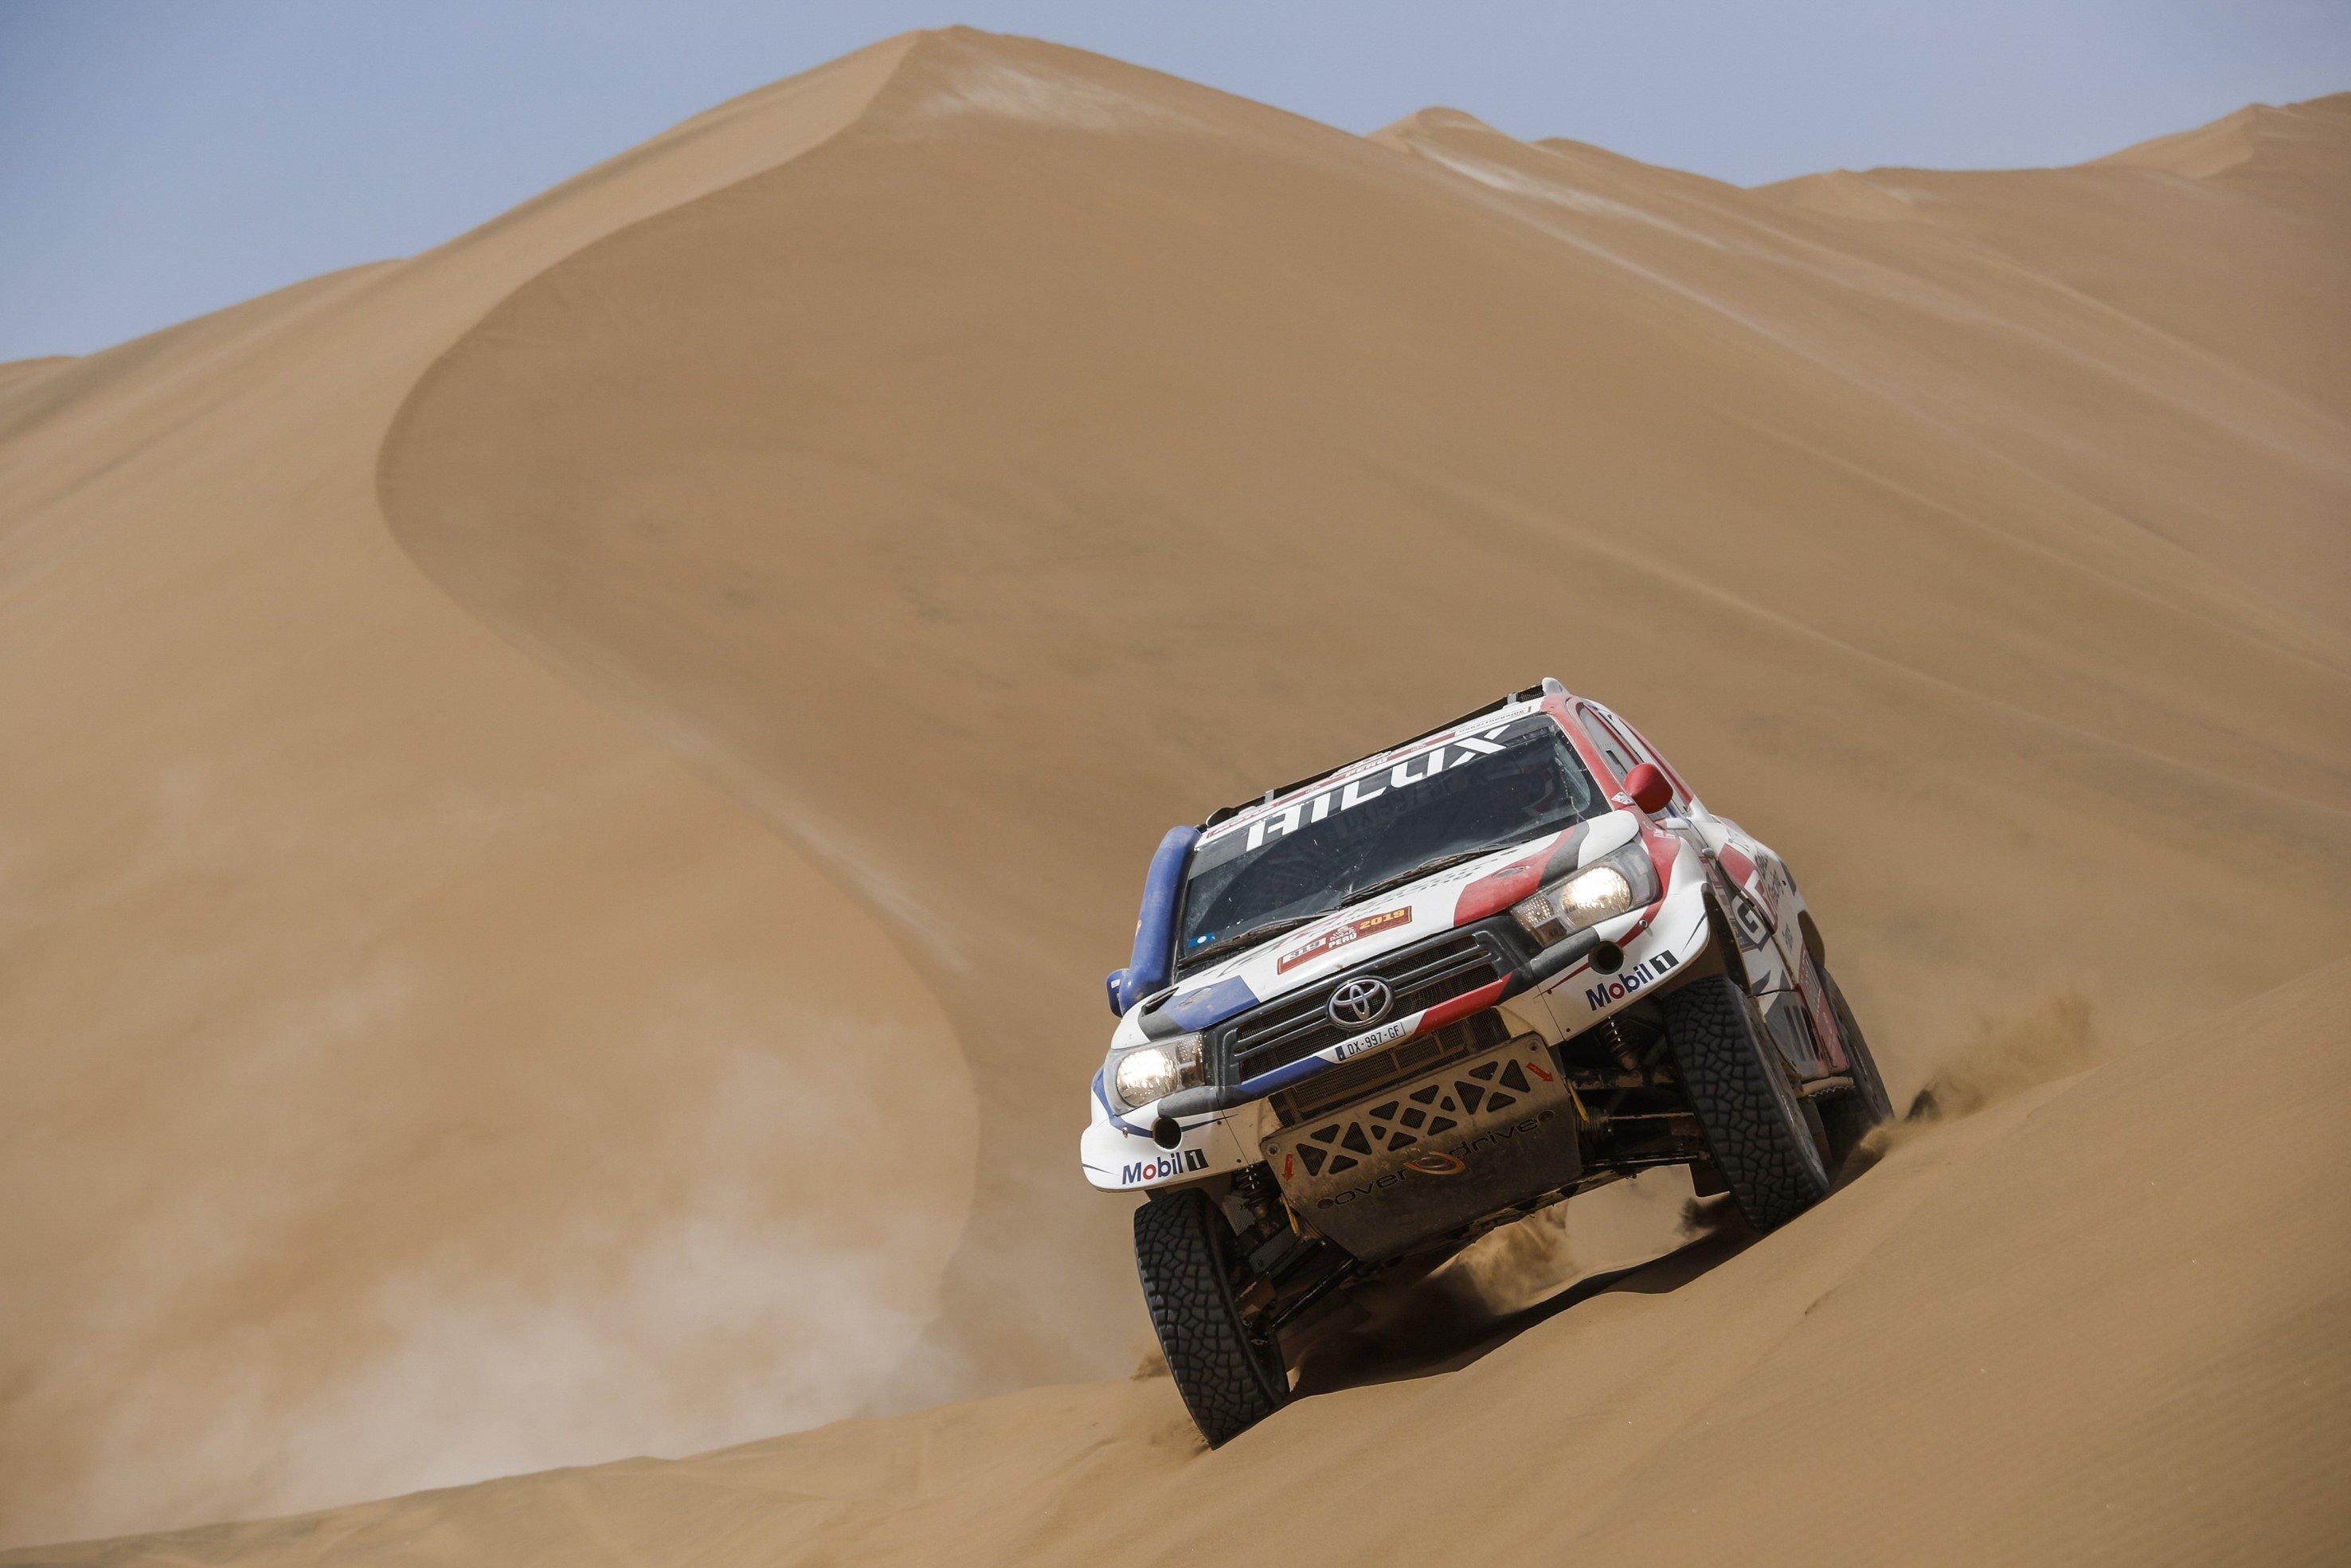 Mobil 1 in Dakar Rally 2019